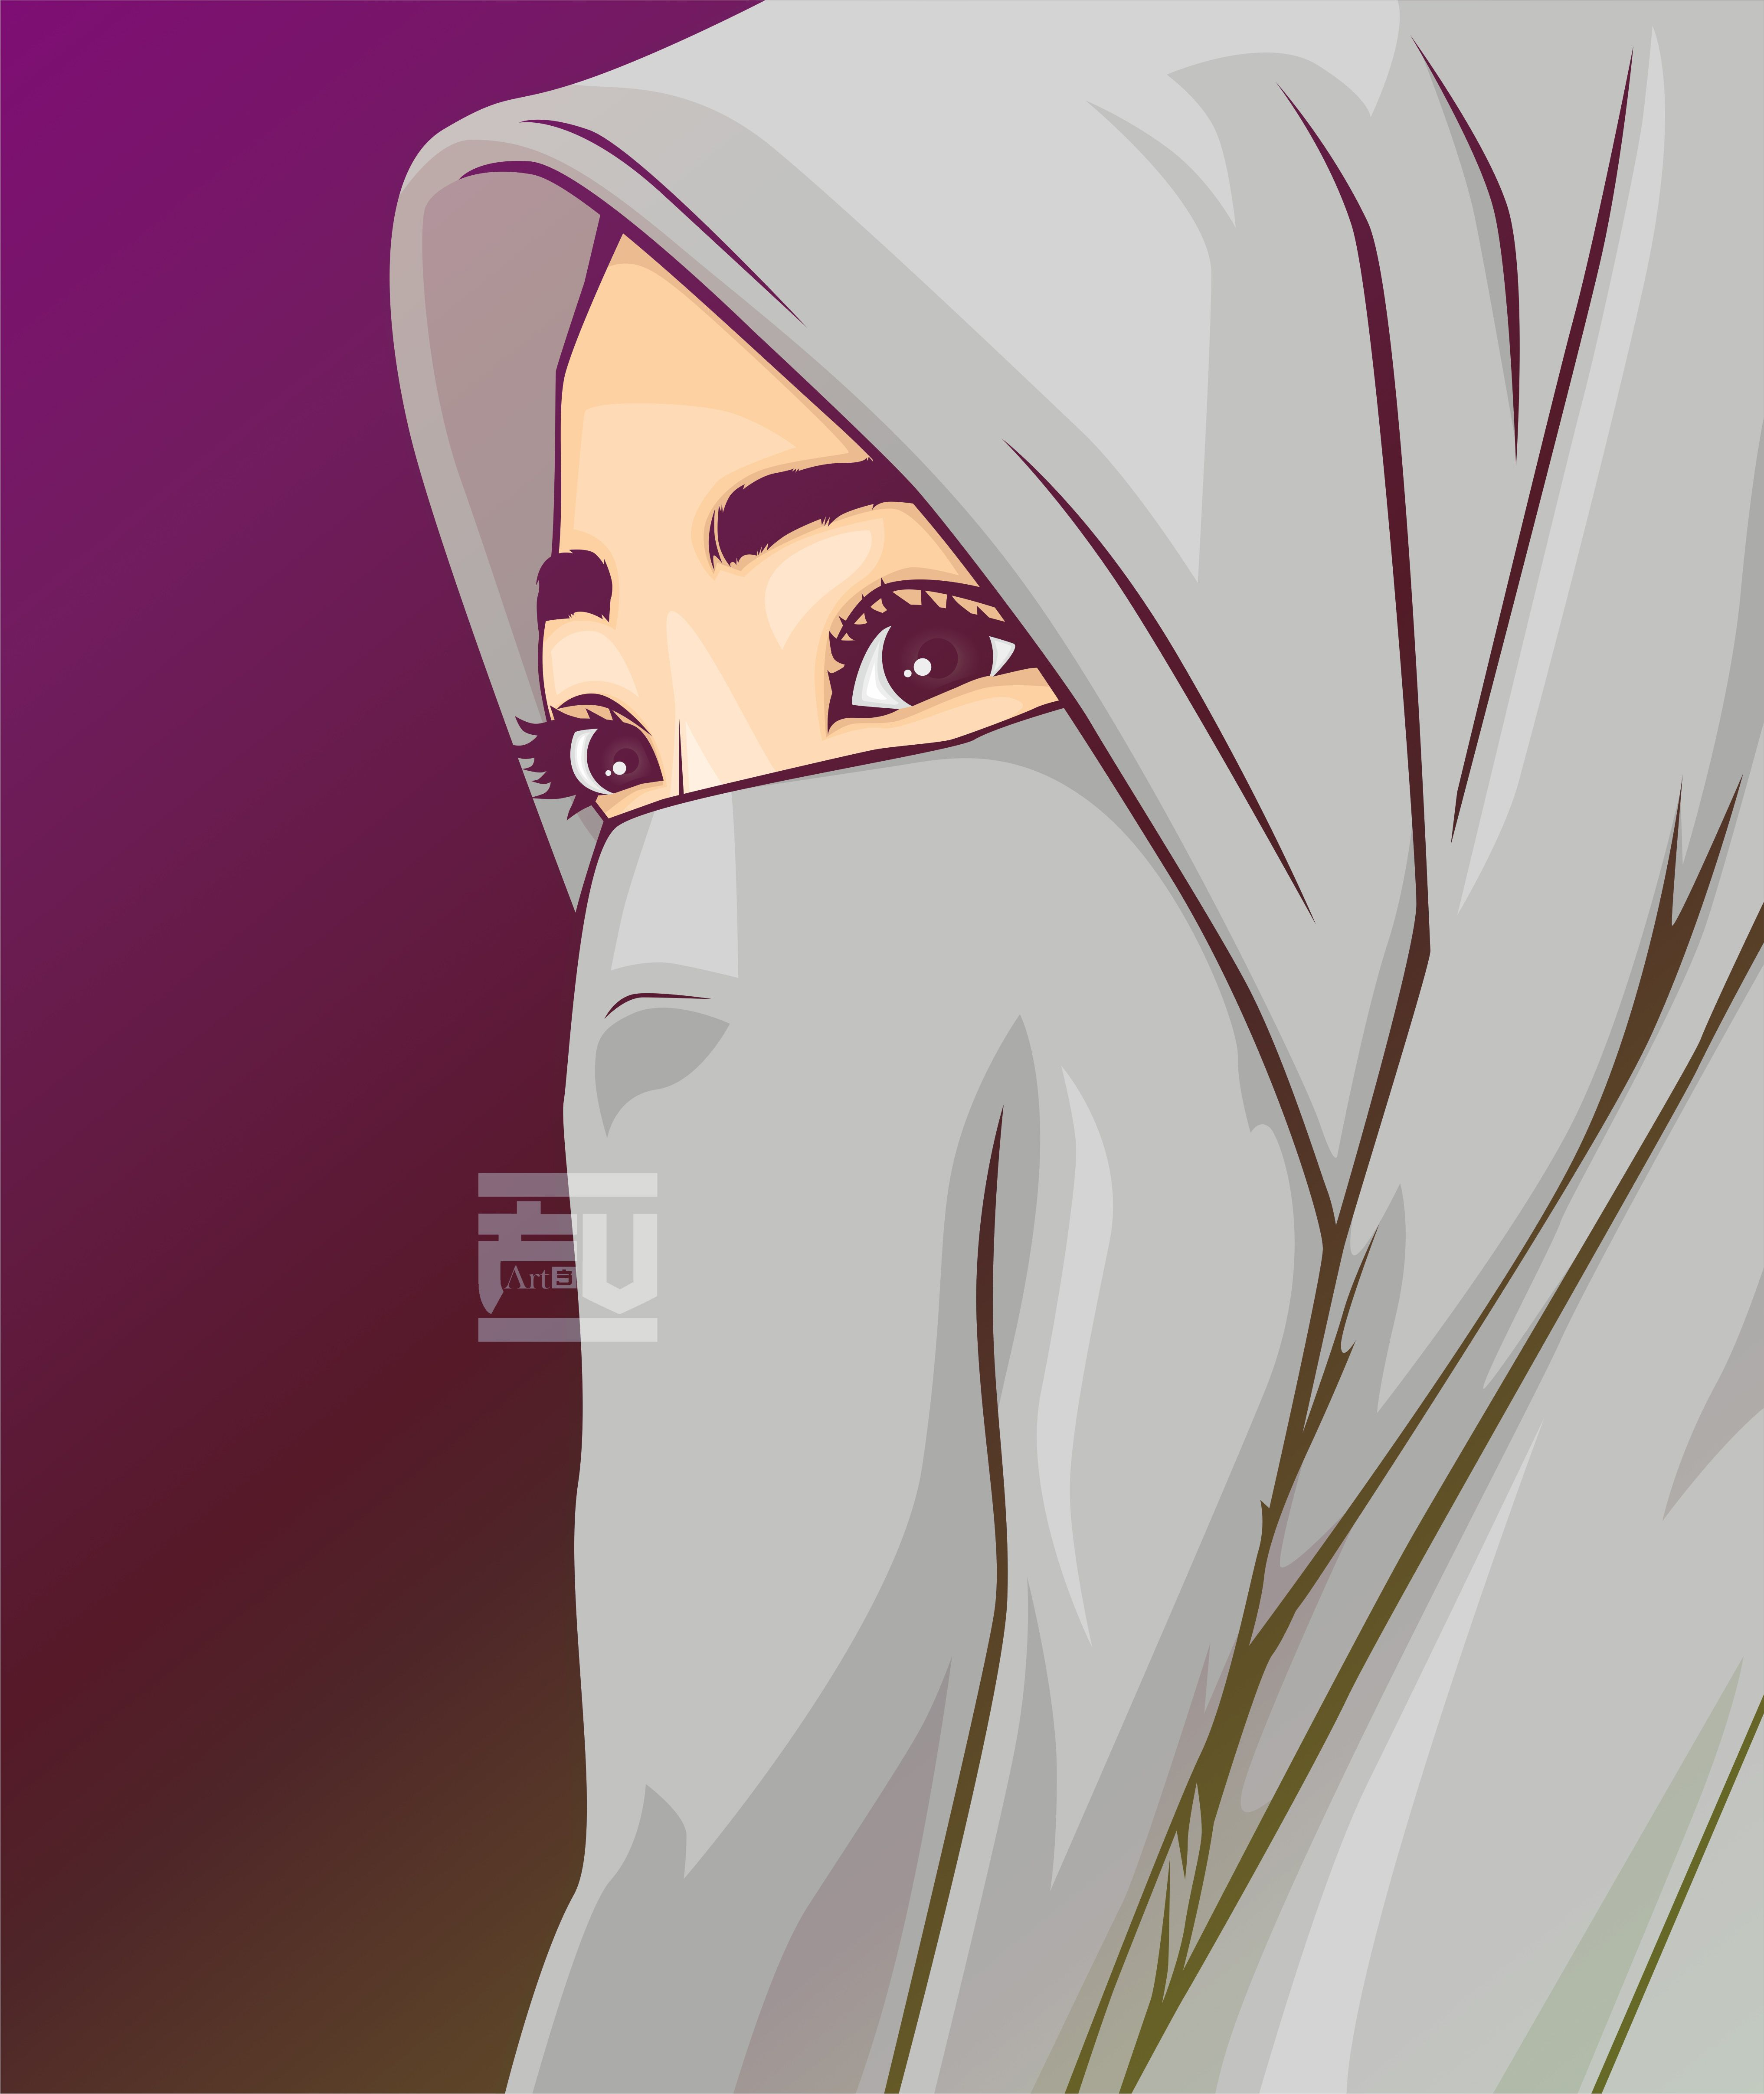 Hijab Vector Niqab Ahmadfu22 Gambar Gambar Animasi Kartun Kartun